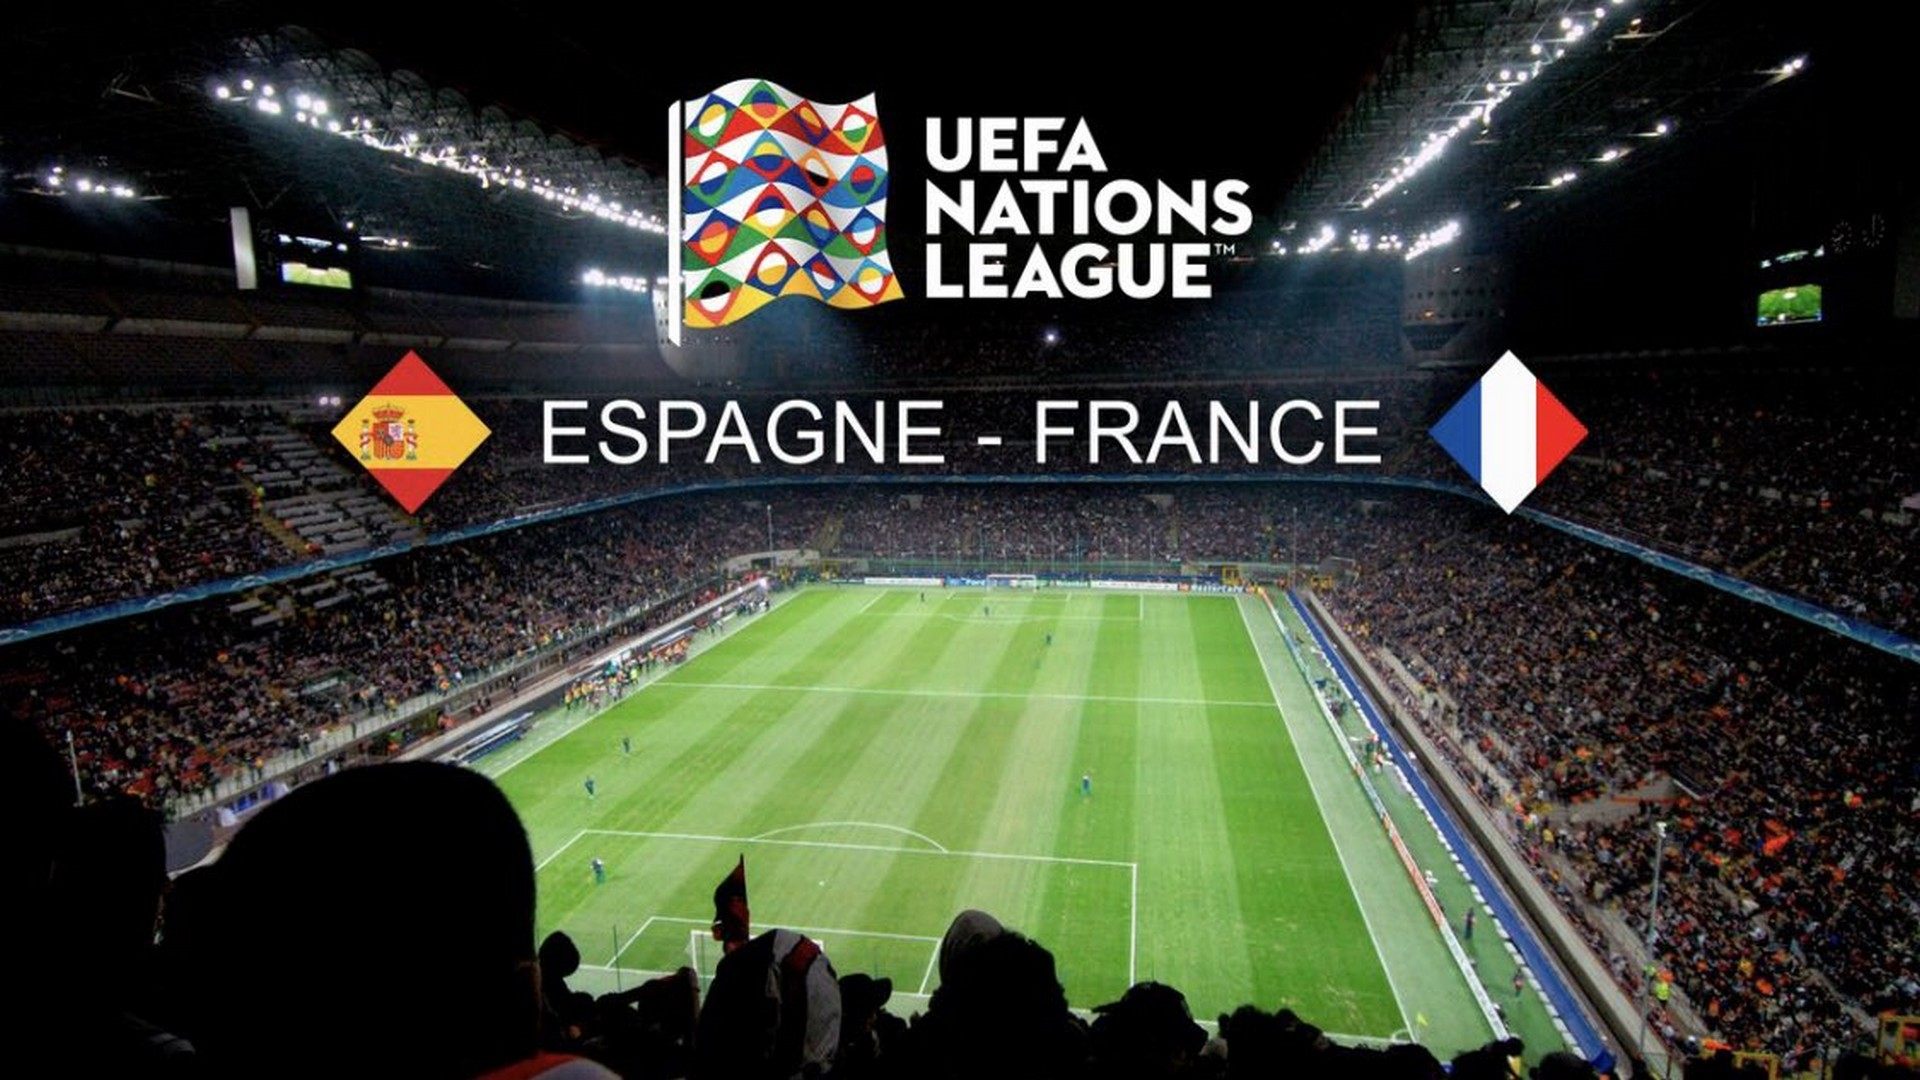 M6 – Football Espagne France